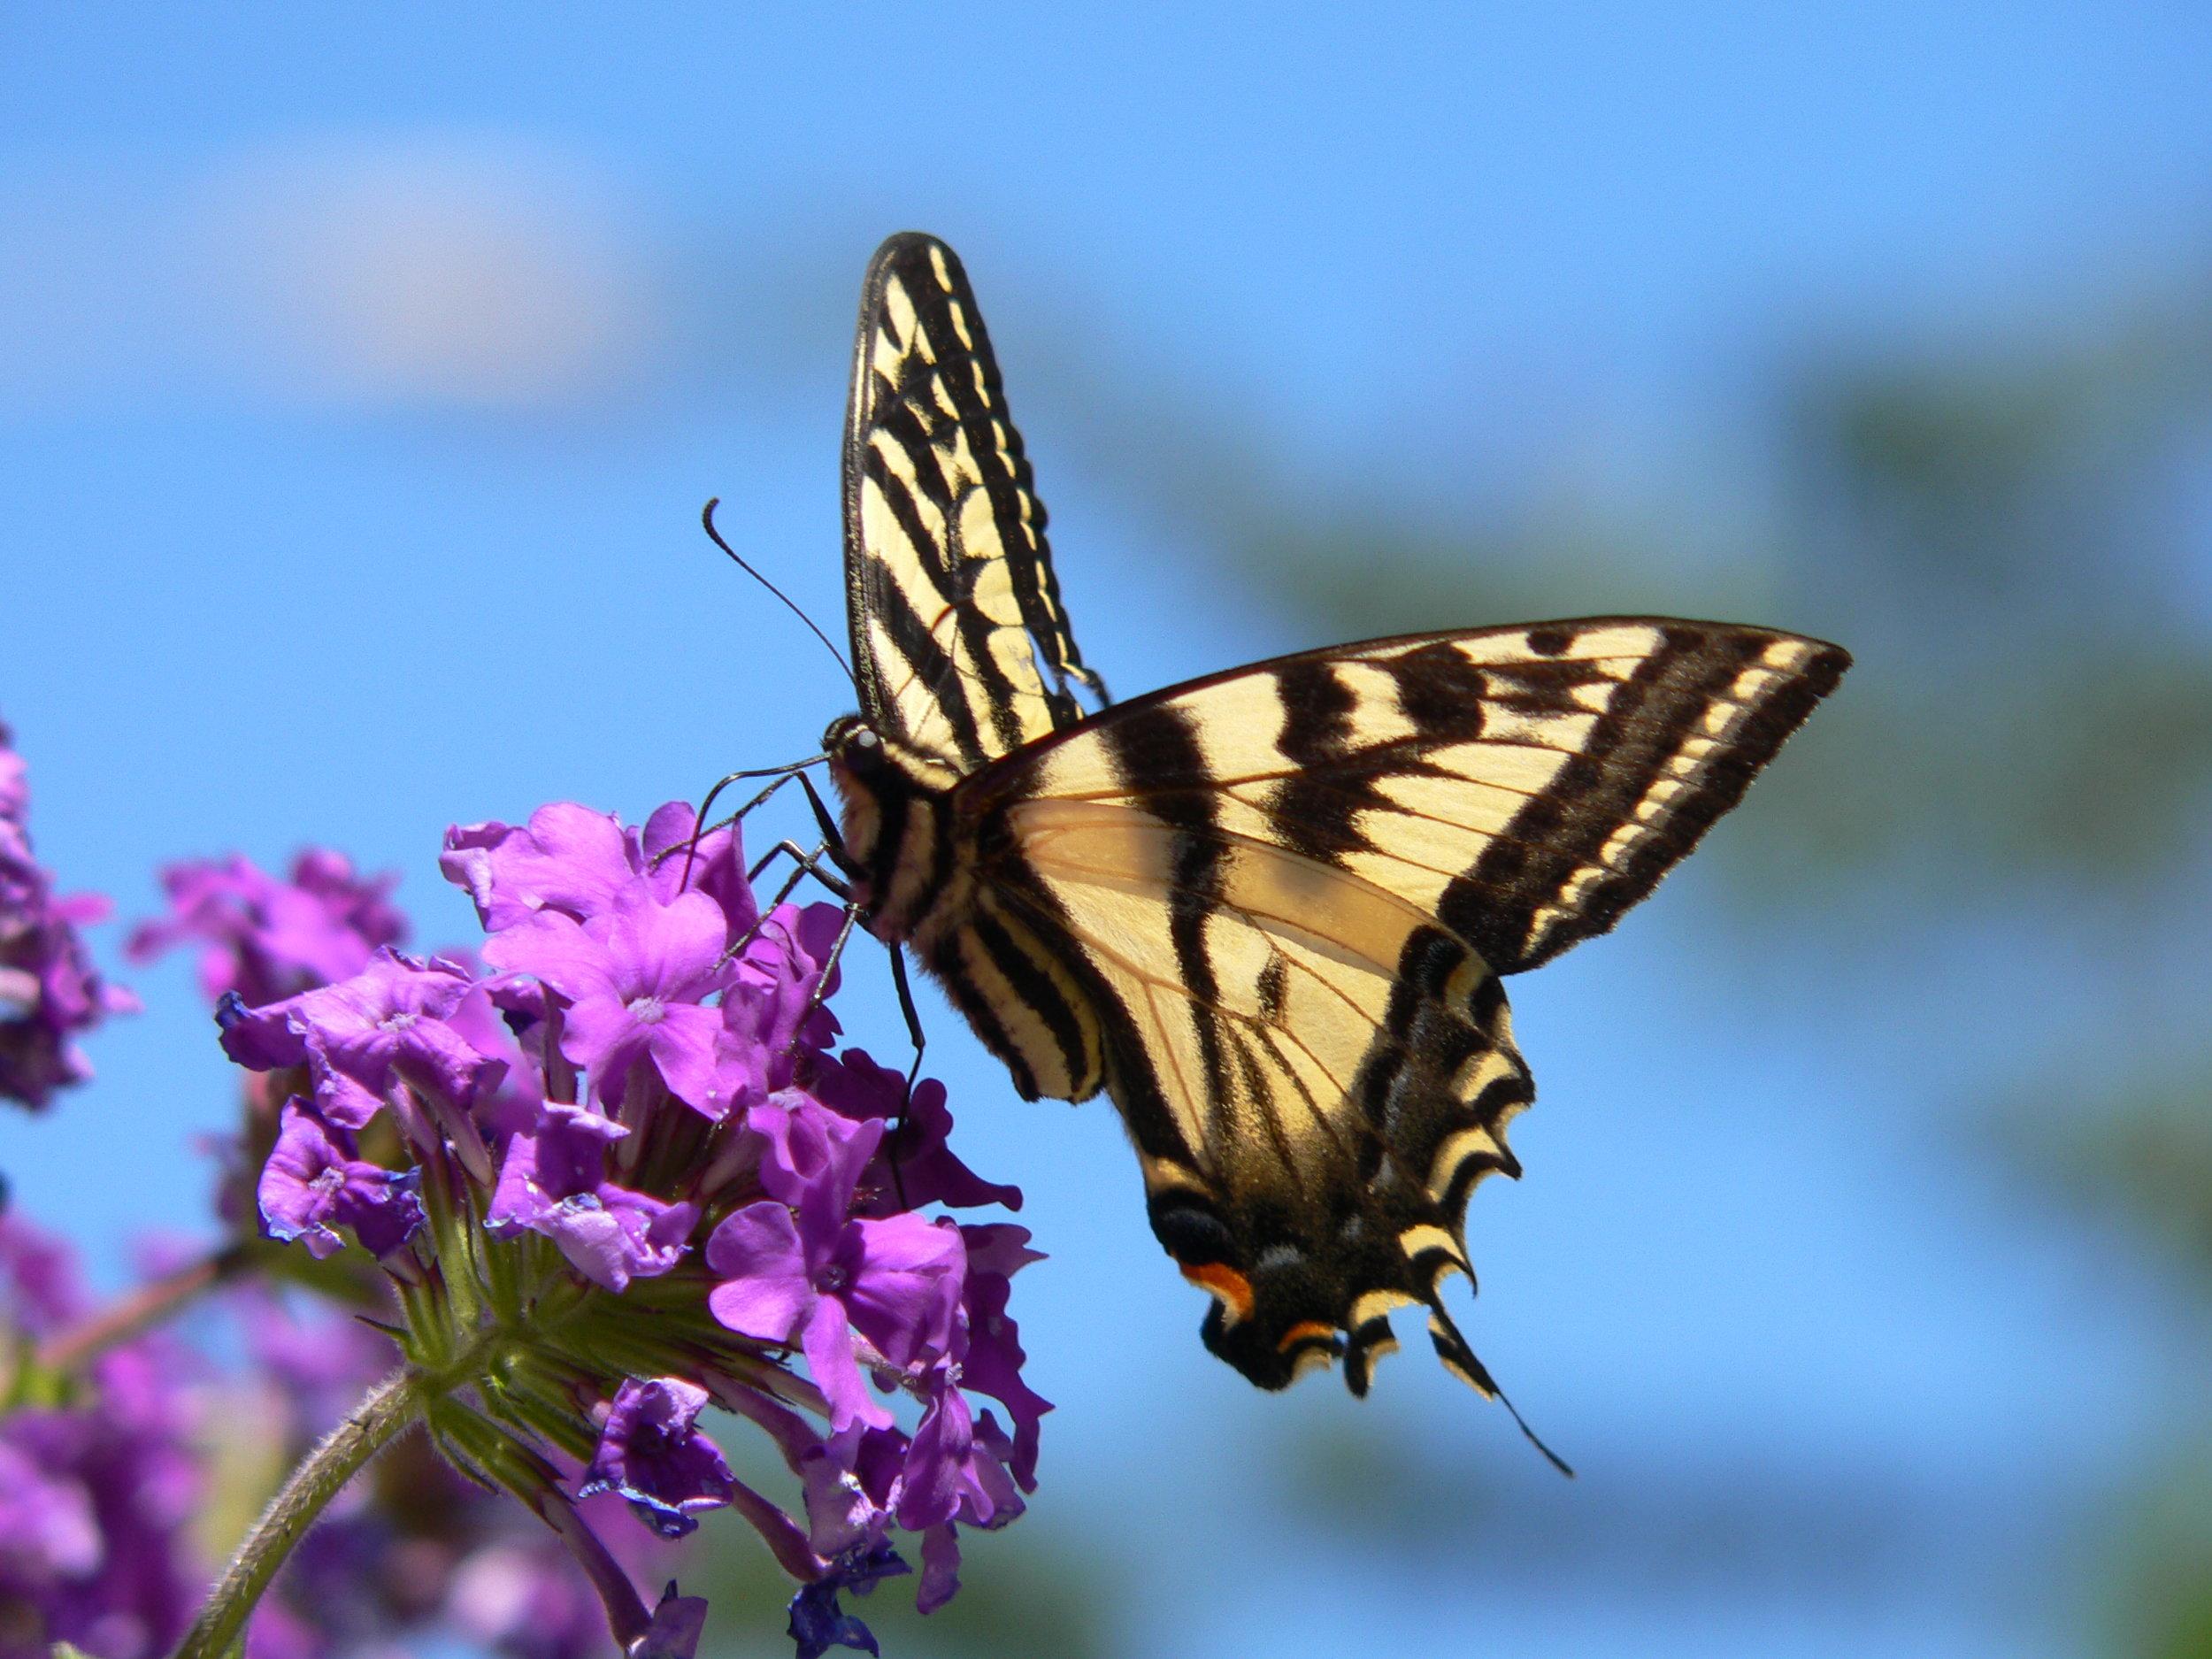 2005-07-21 Butterfly Tiger Swallowtail 102 - Doris May.jpg